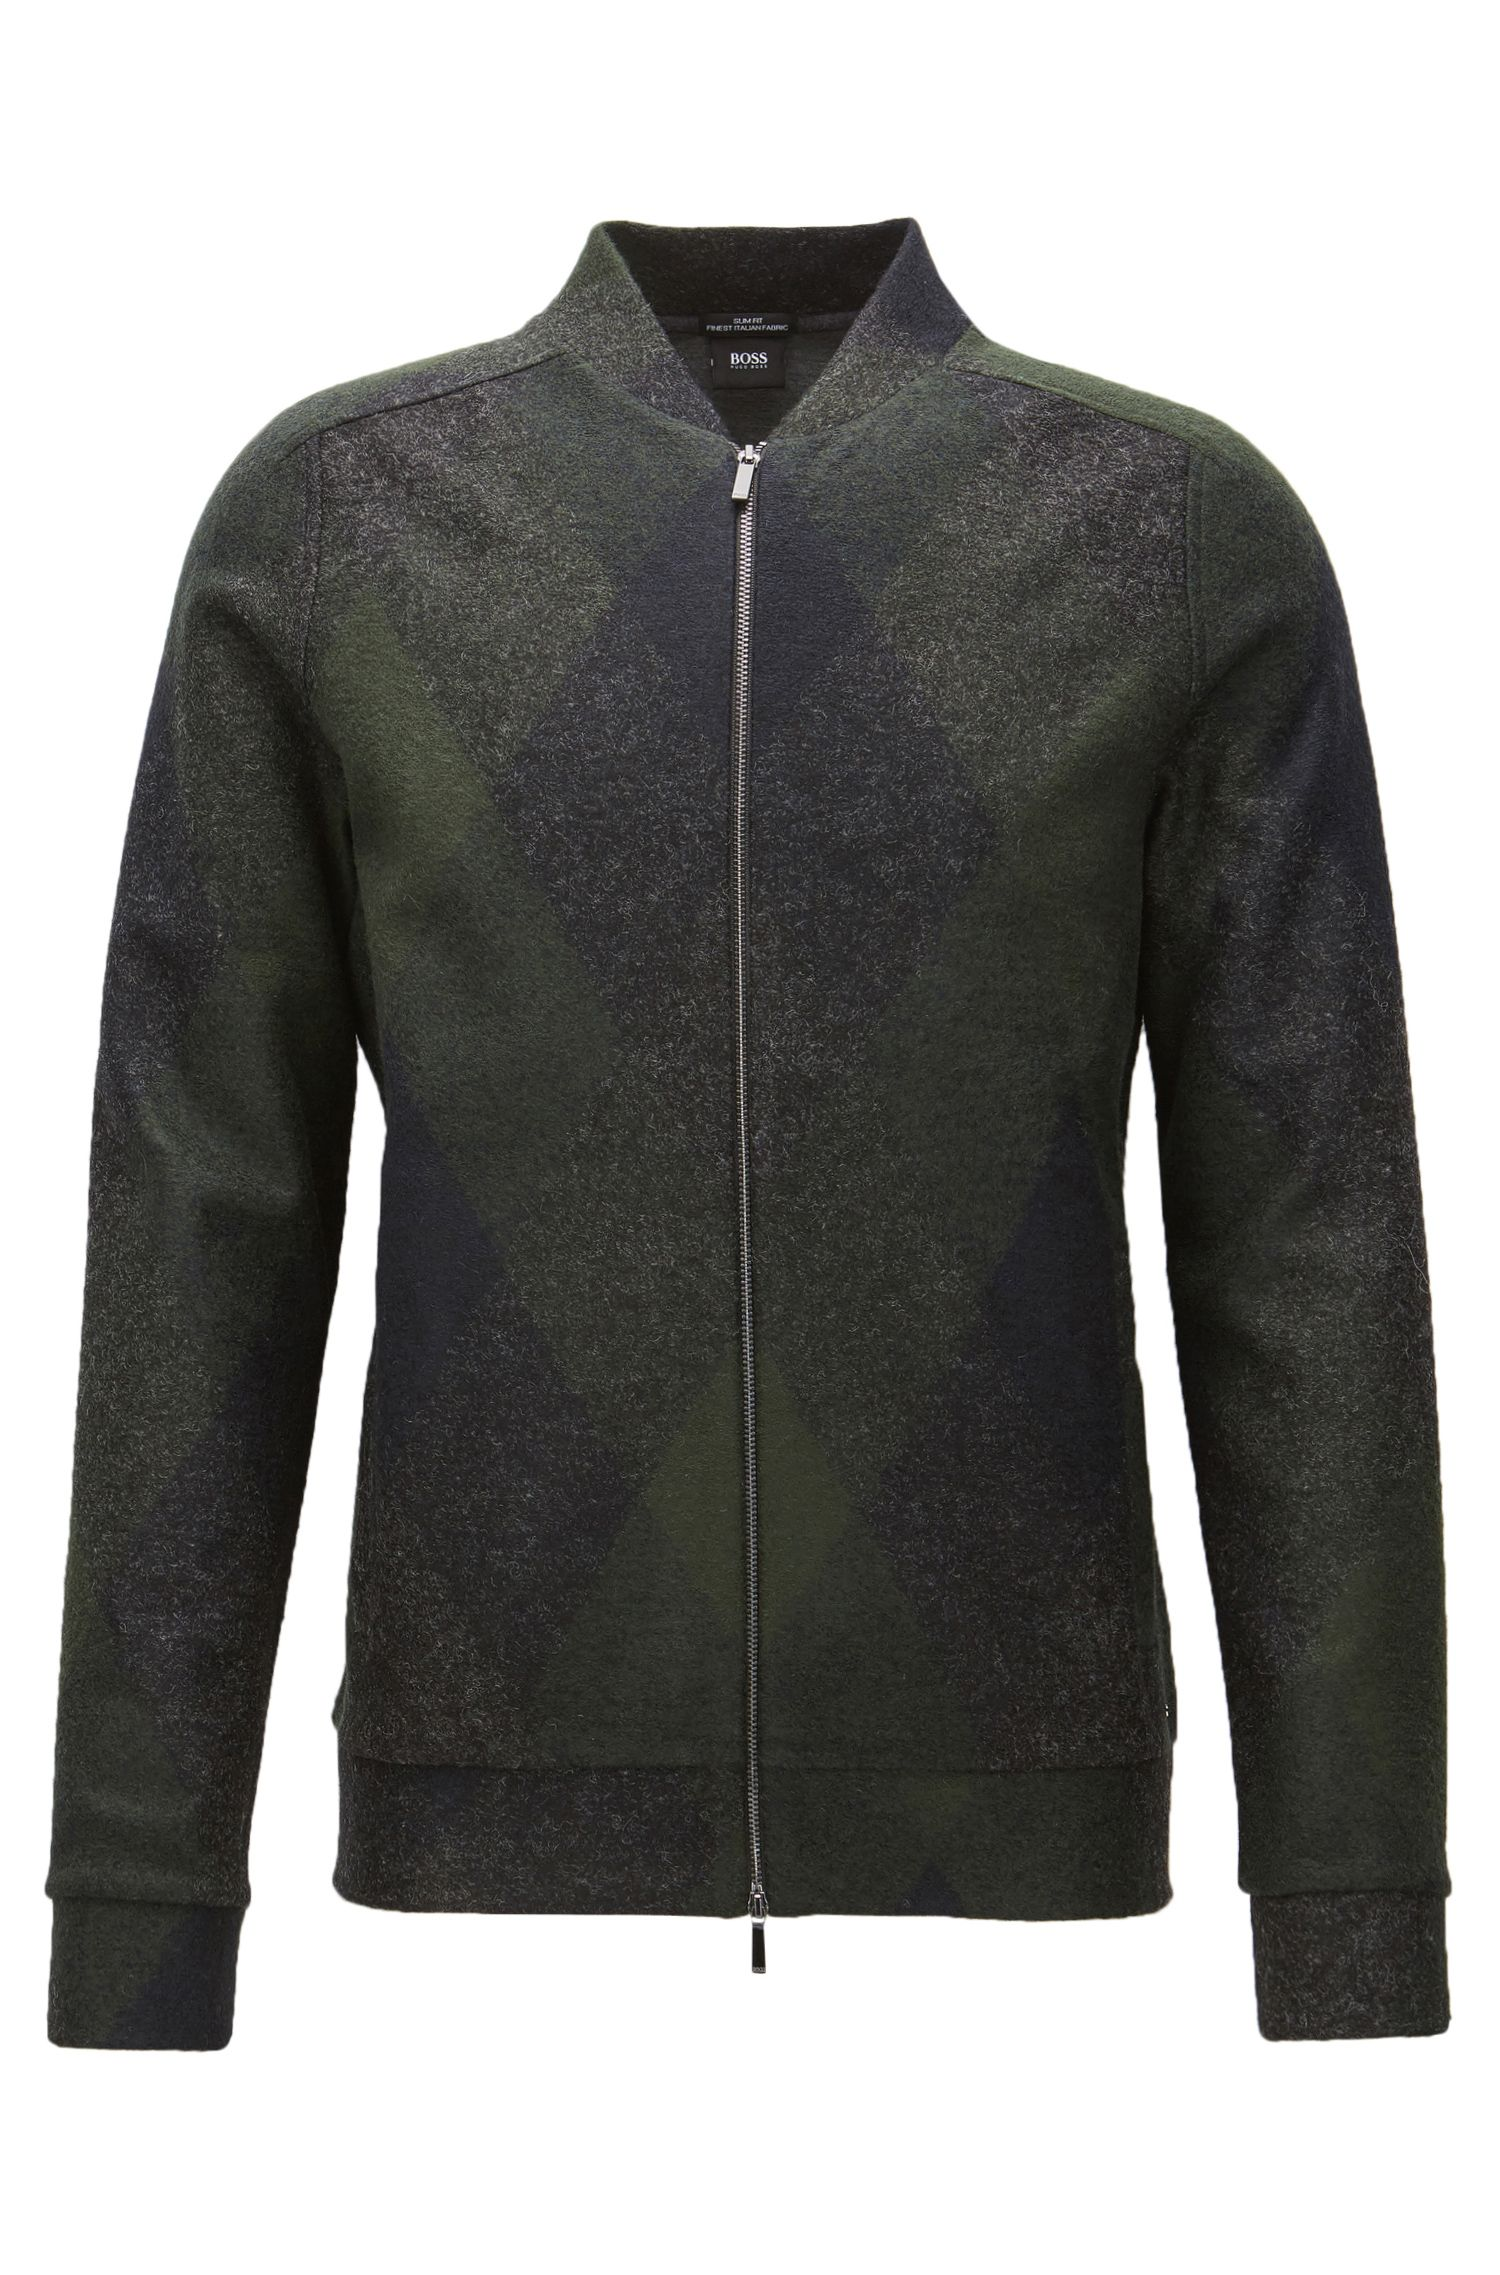 Italian Stretch Sweater Jacket | Salea